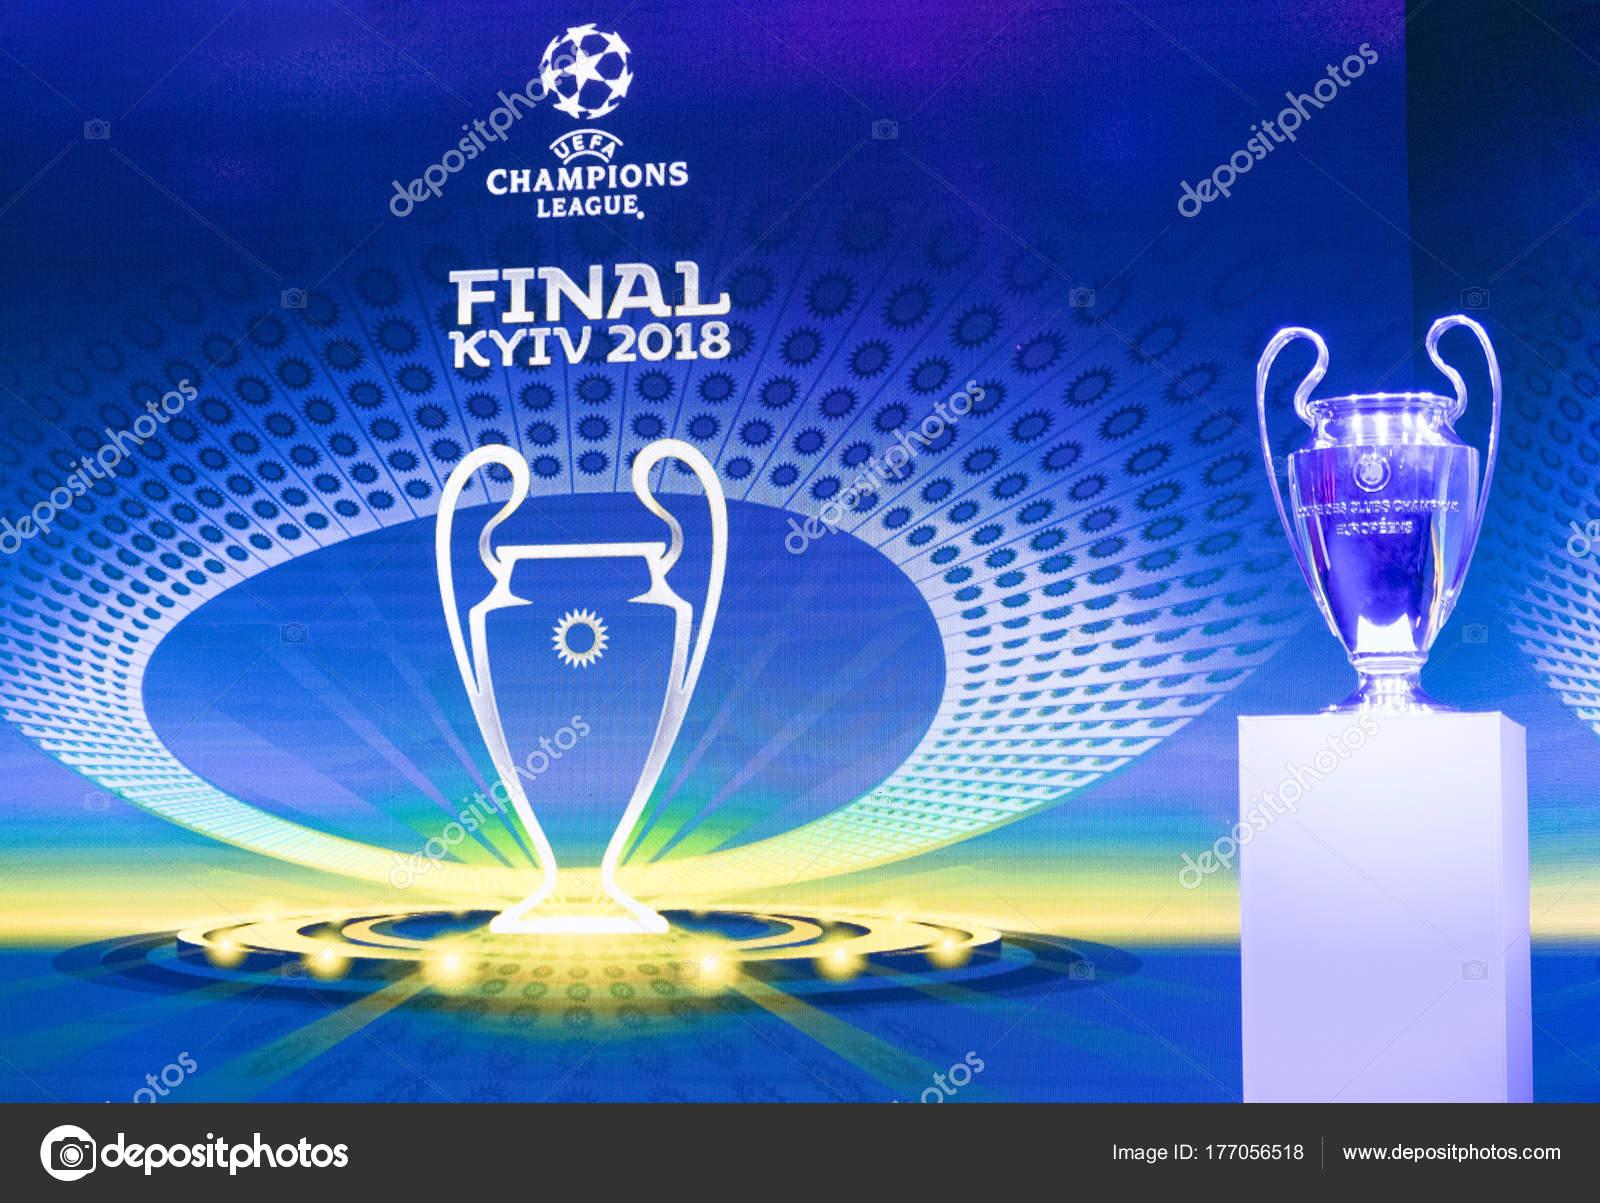 Uefa Champions League Logo : Champions League Logo, Ofc ...